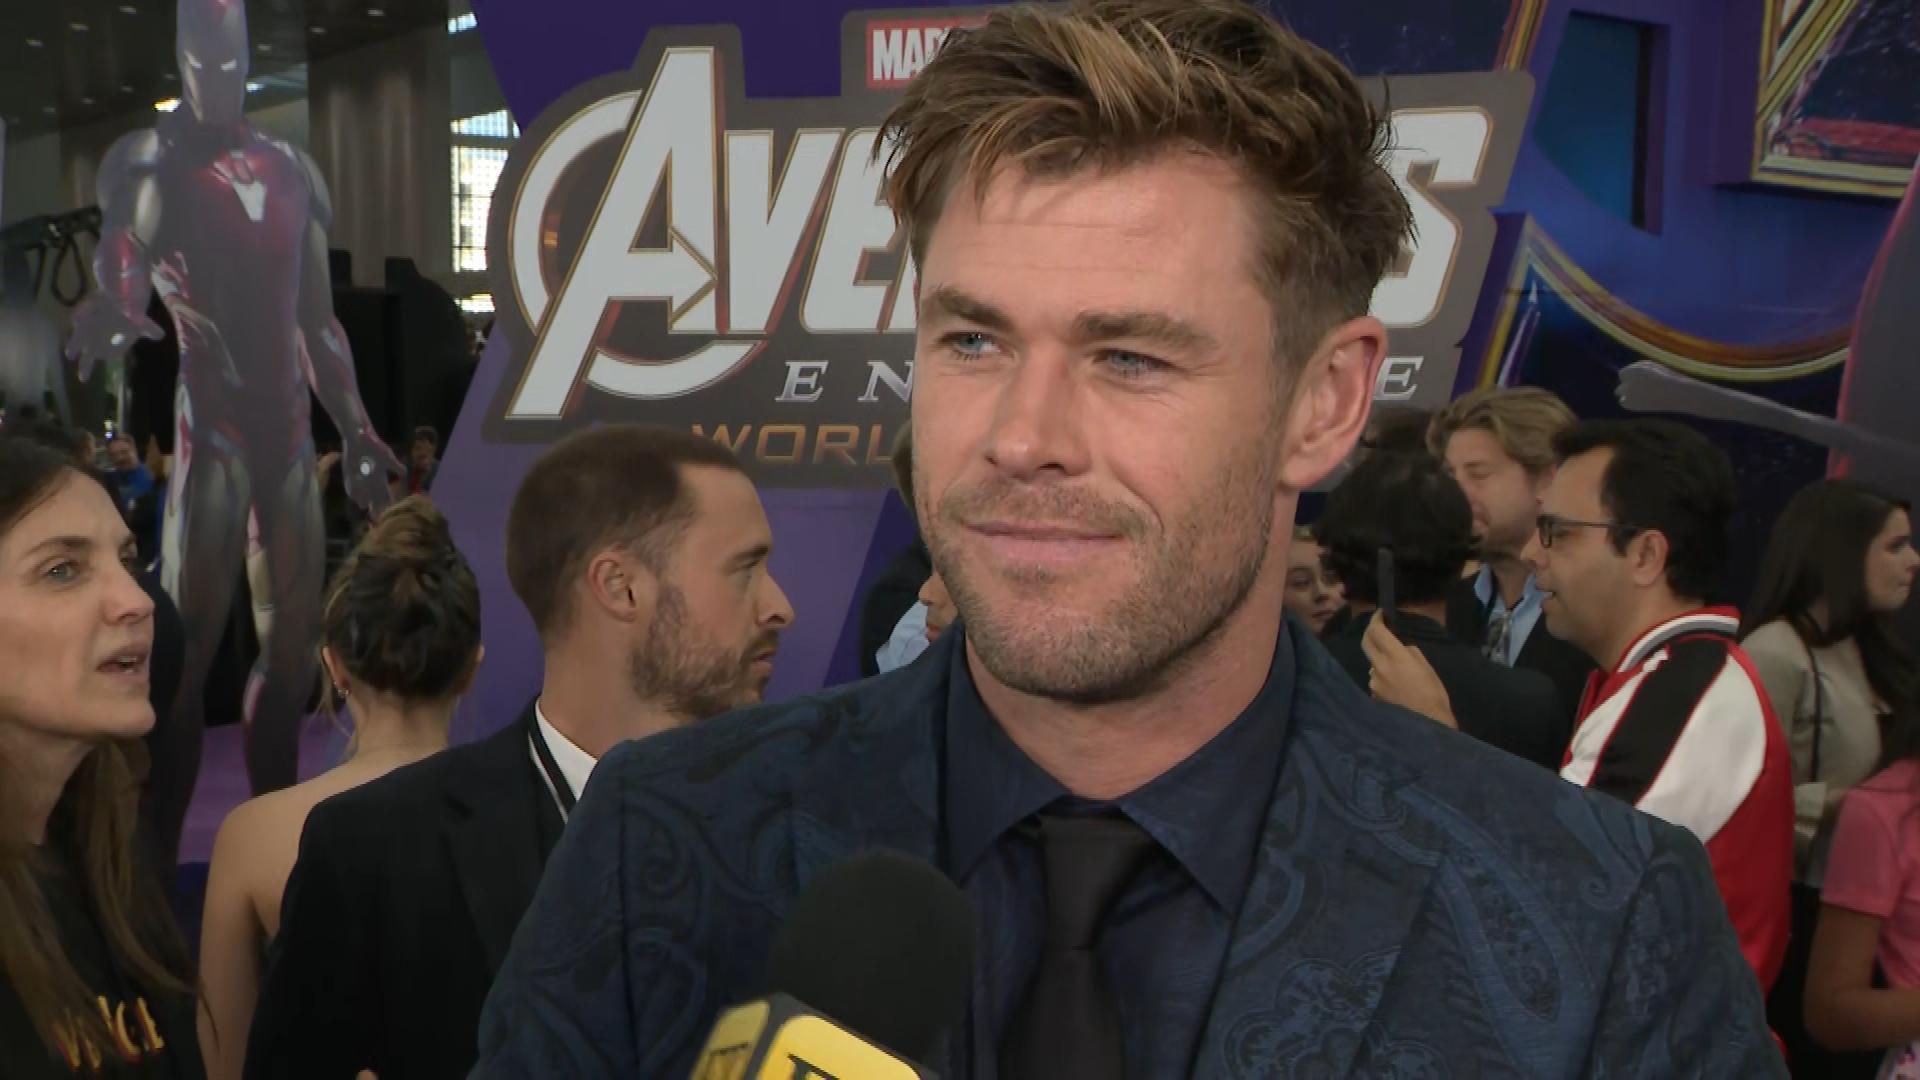 Chris Hemsworth Says The Avengers Endgame Premiere Is